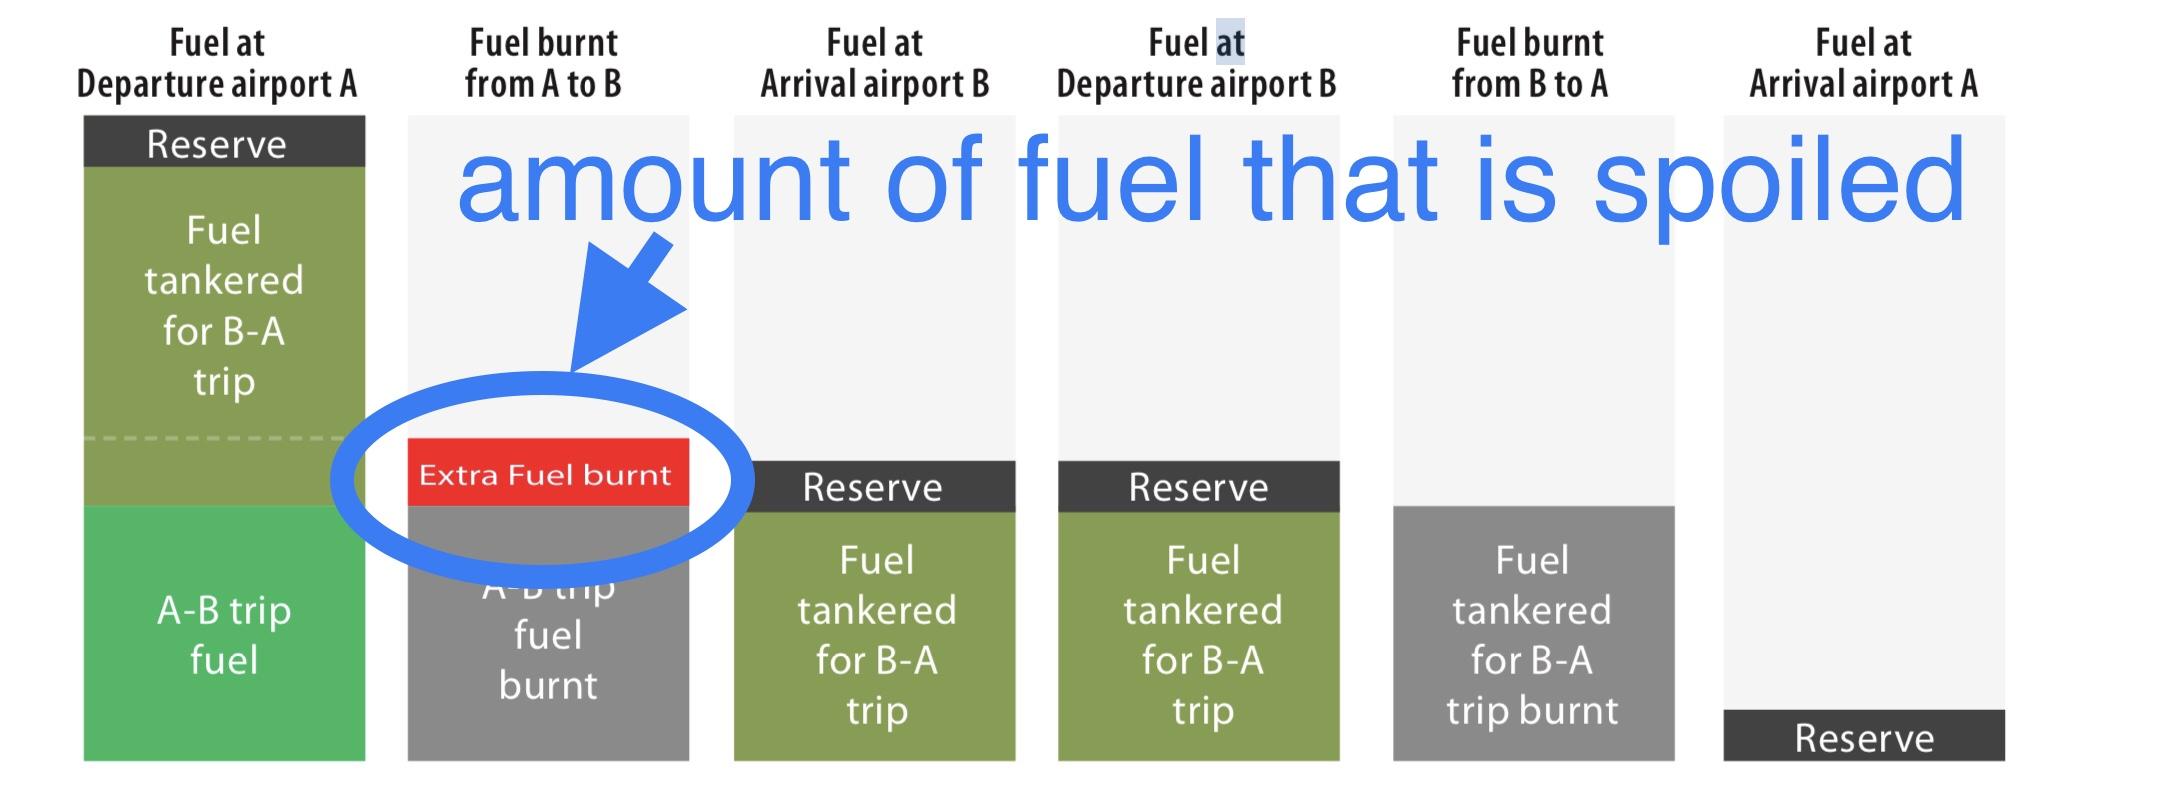 https://www.eurocontrol.int/publication/fuel-tankering-european-skies-economic-benefits-and-environmental-impact